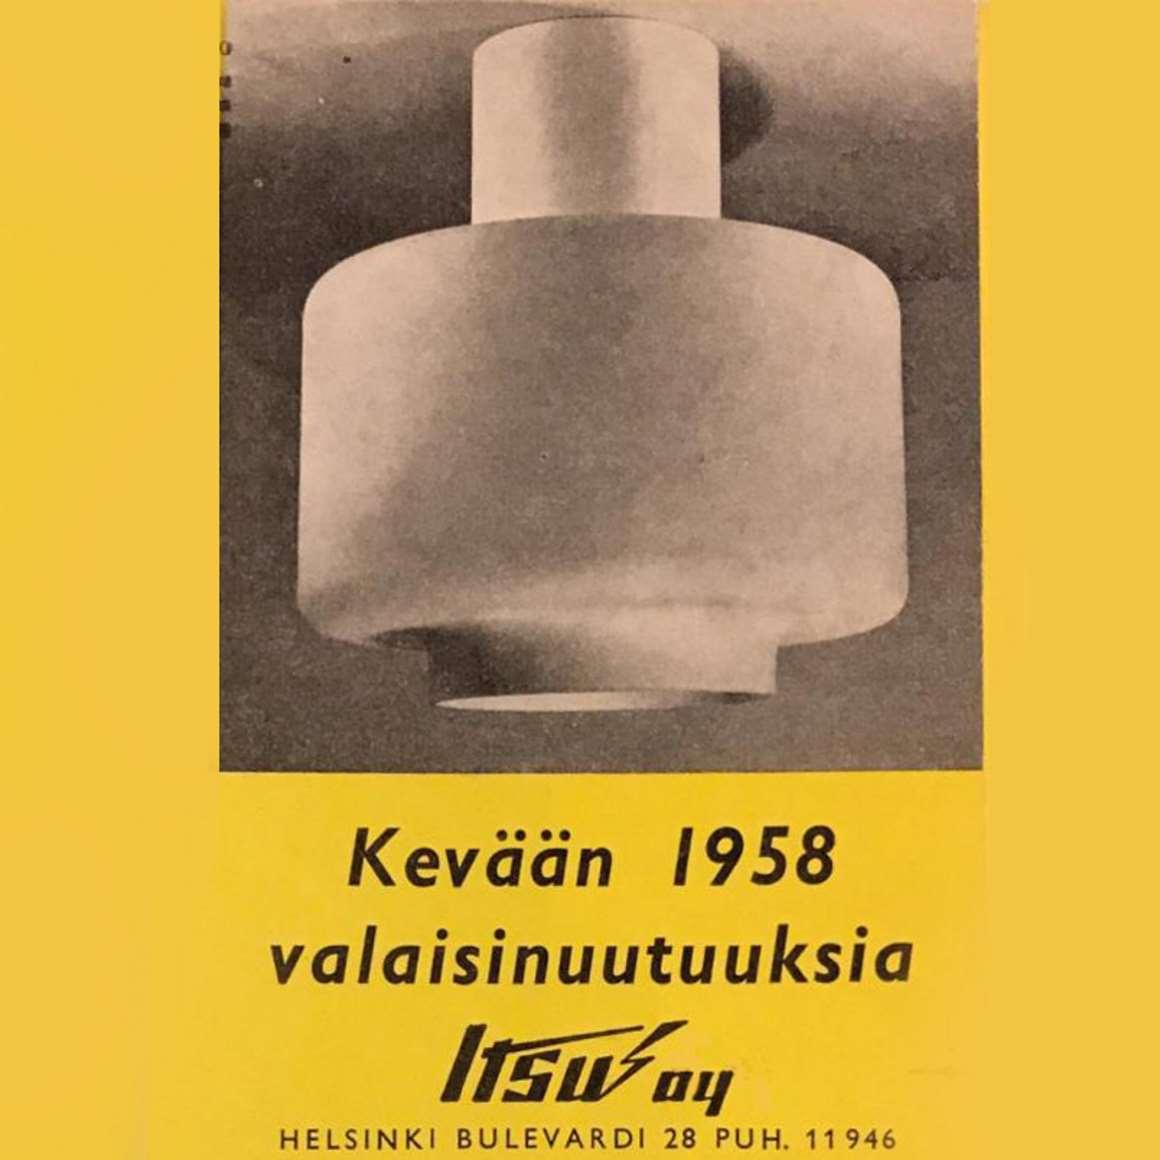 Itsu Oy 1958 Lighting Catalogue